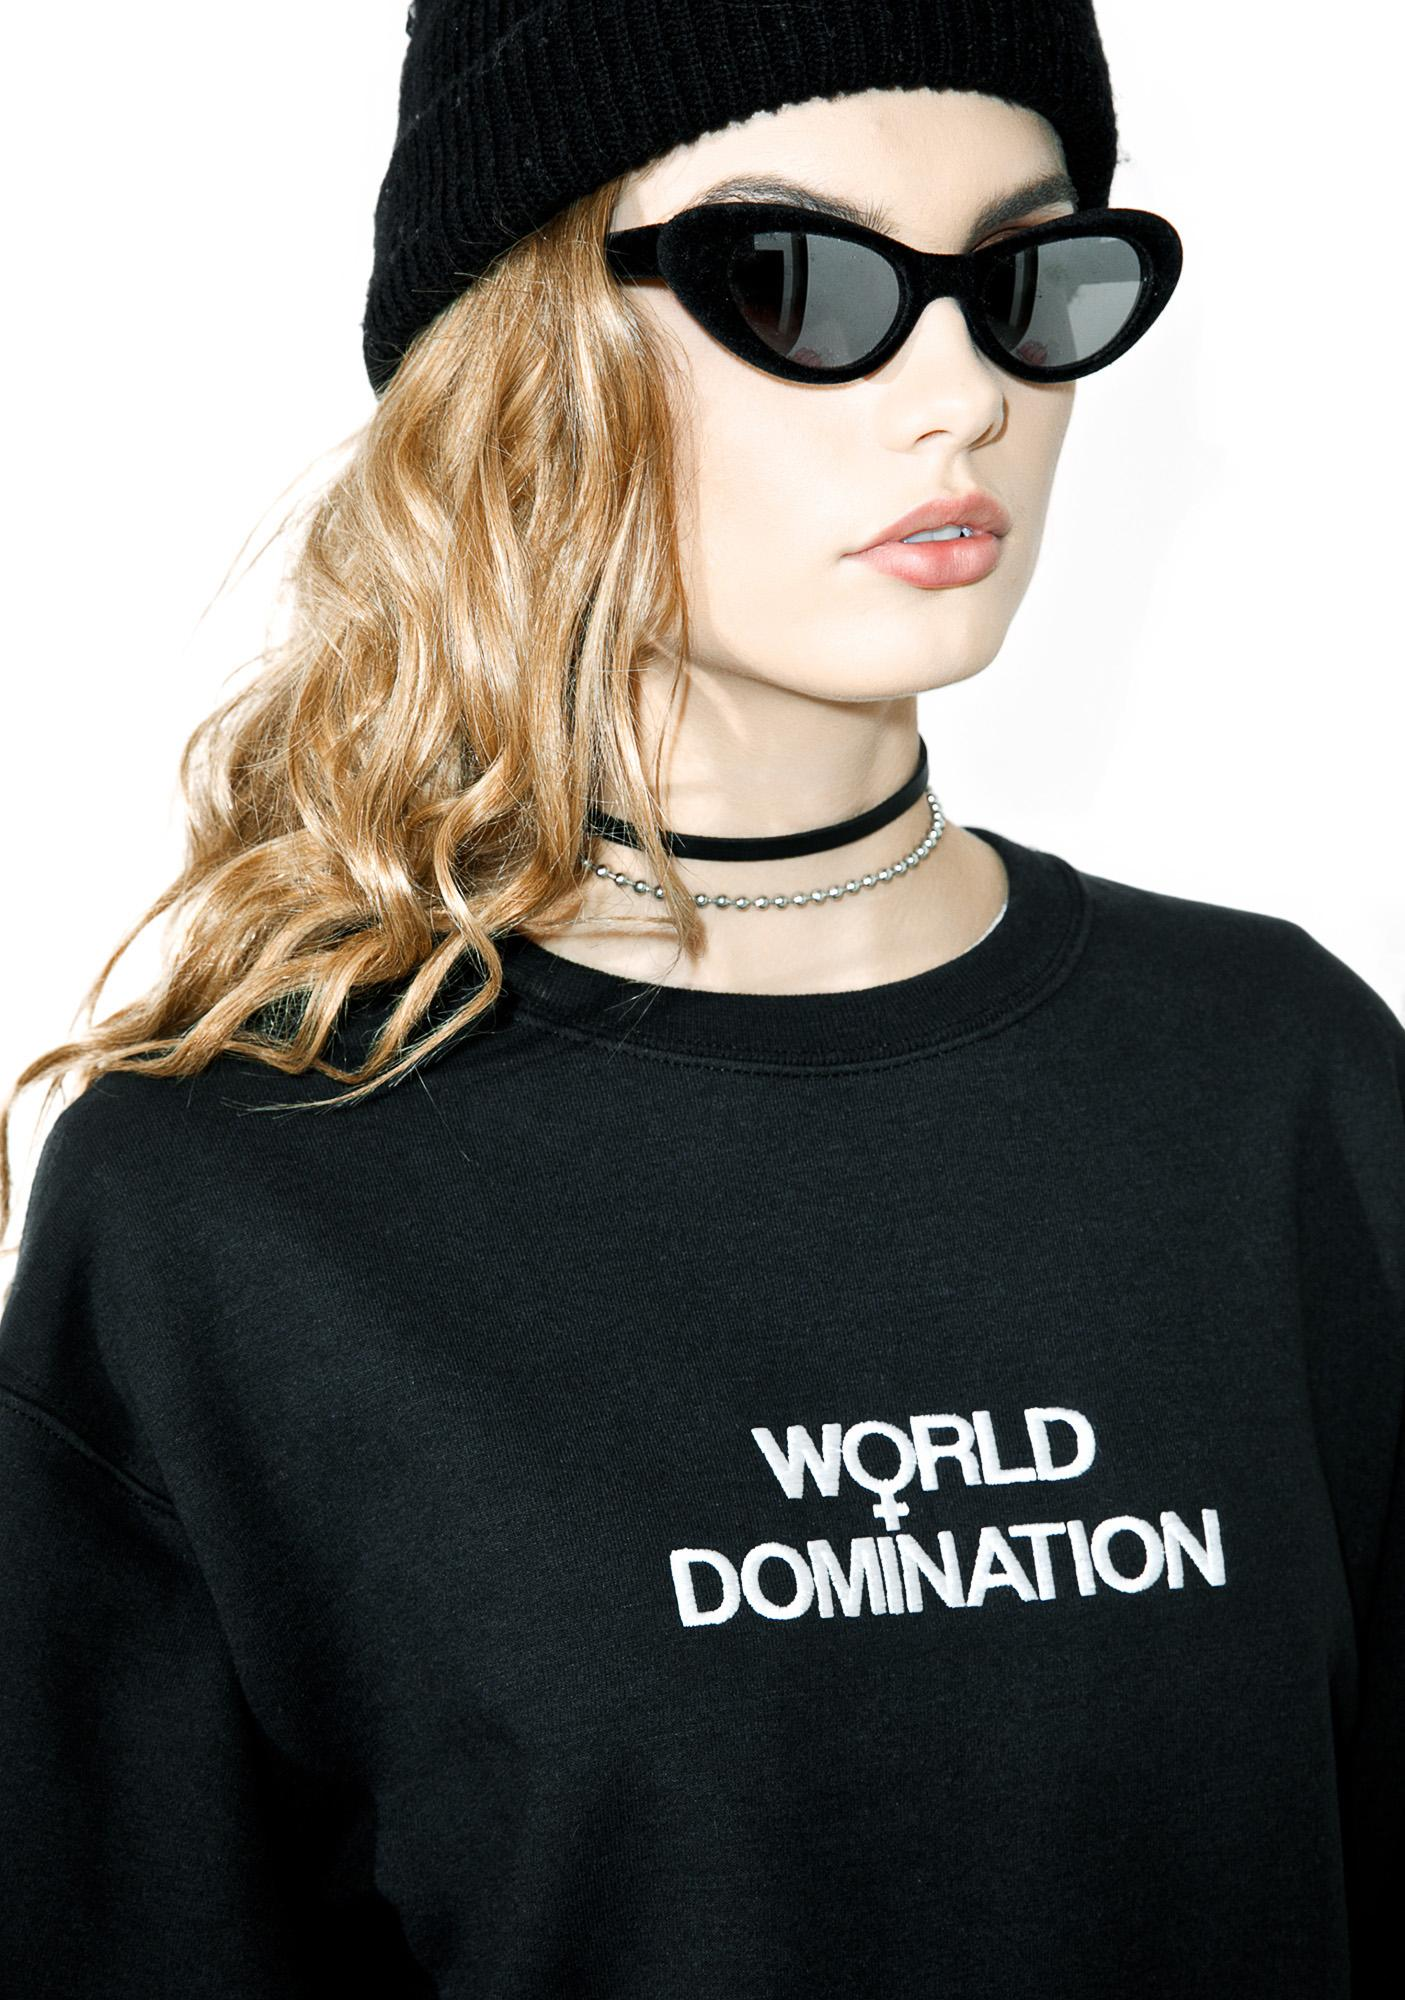 Petals and Peacocks Women's World Sweatshirt